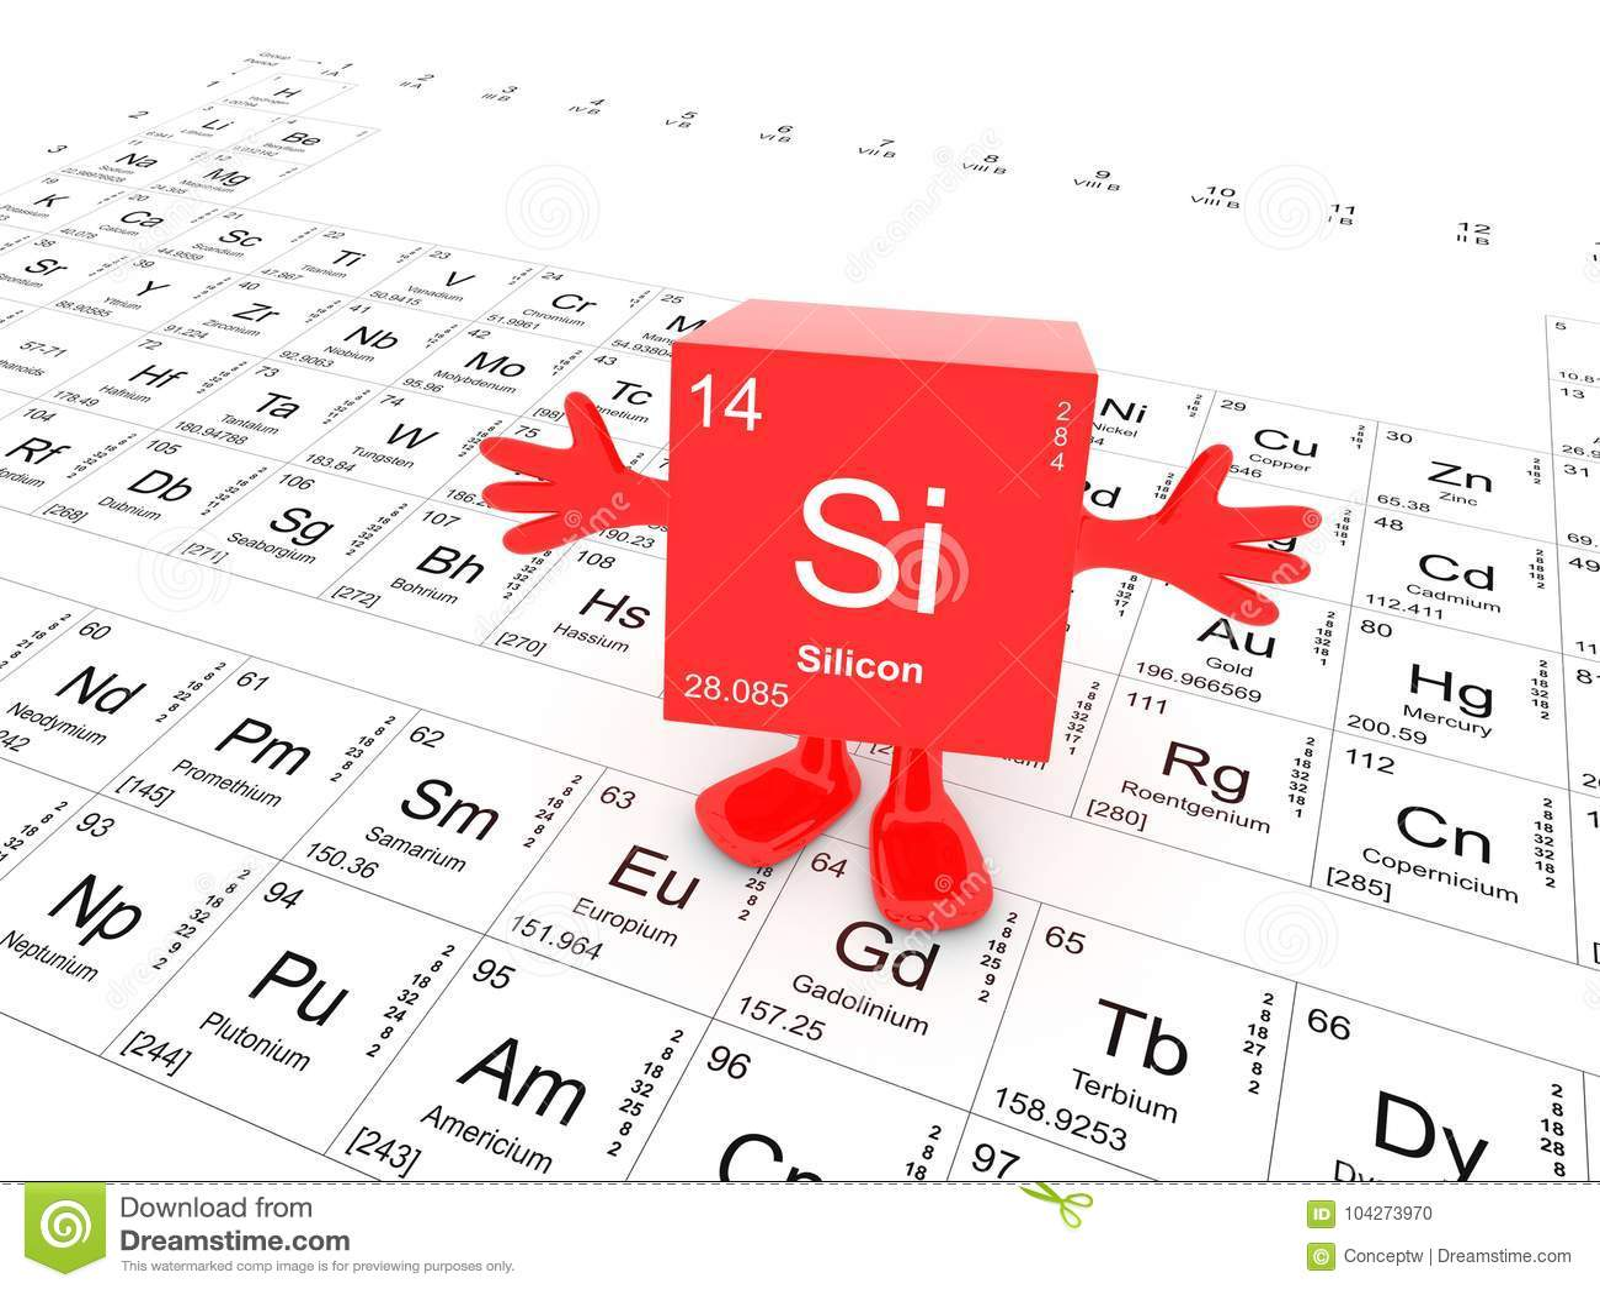 Silicon element symbol stock illustration illustration of silicon element symbol biocorpaavc Gallery